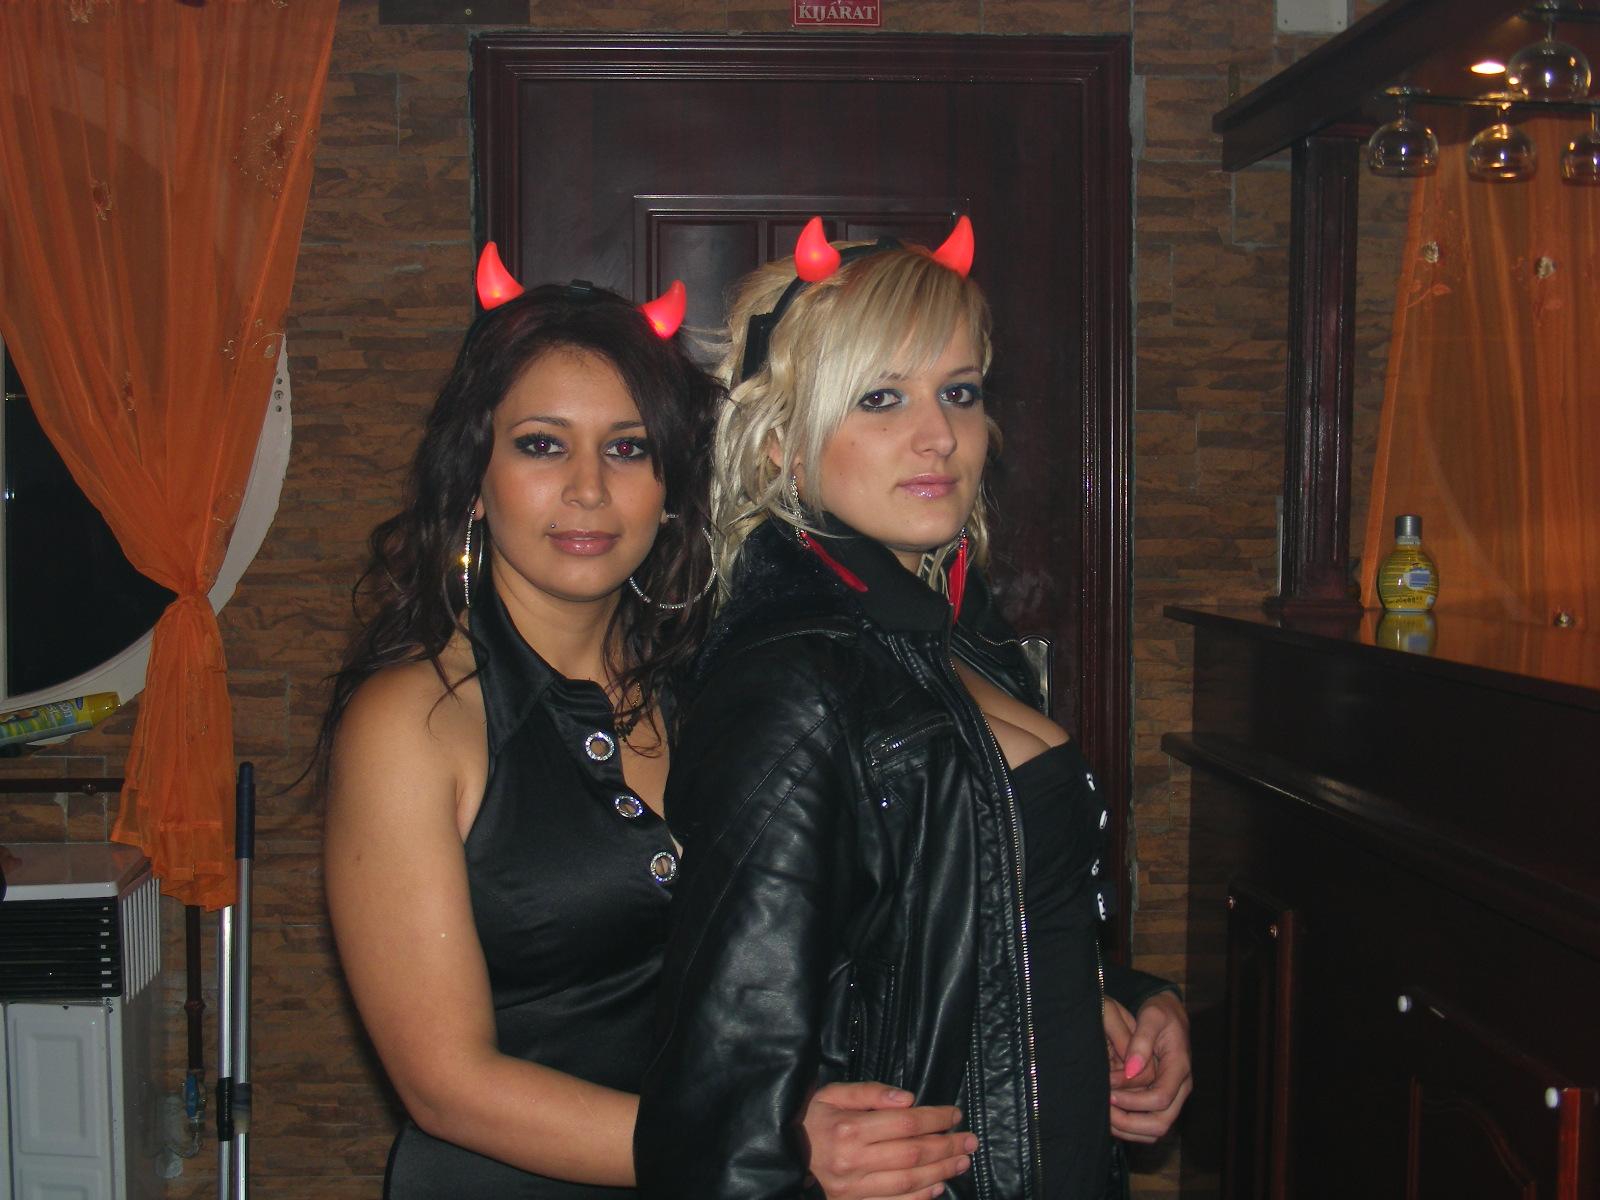 Discoteca en Hungría. Fotos Mohikan Soroko Mikulas-2010-001